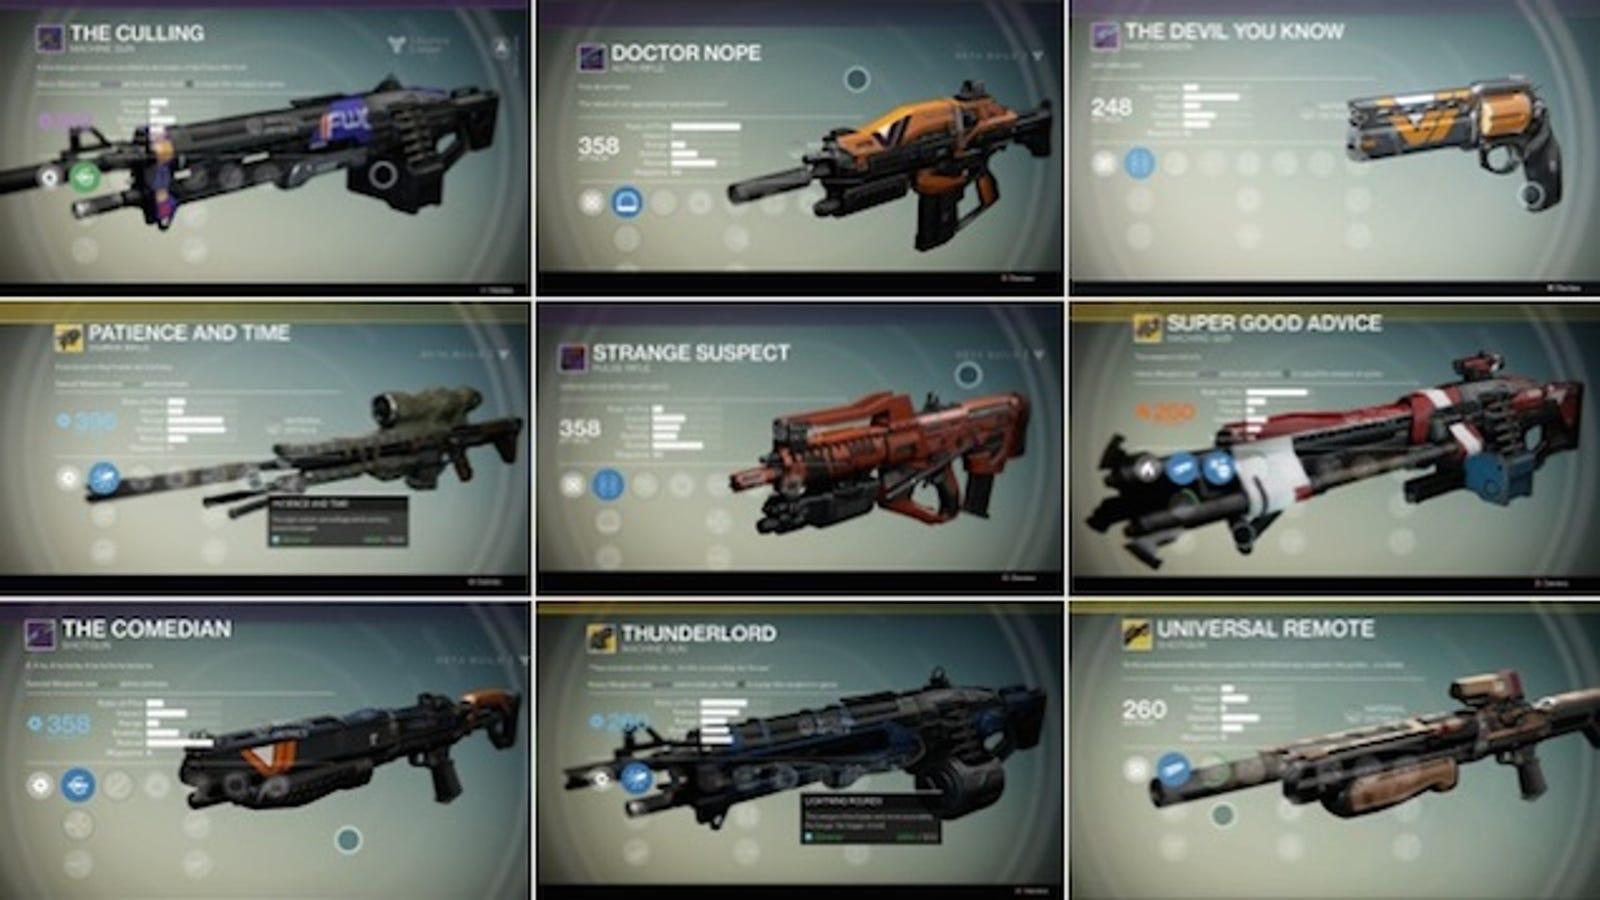 Destiny Gun Names, Ranked